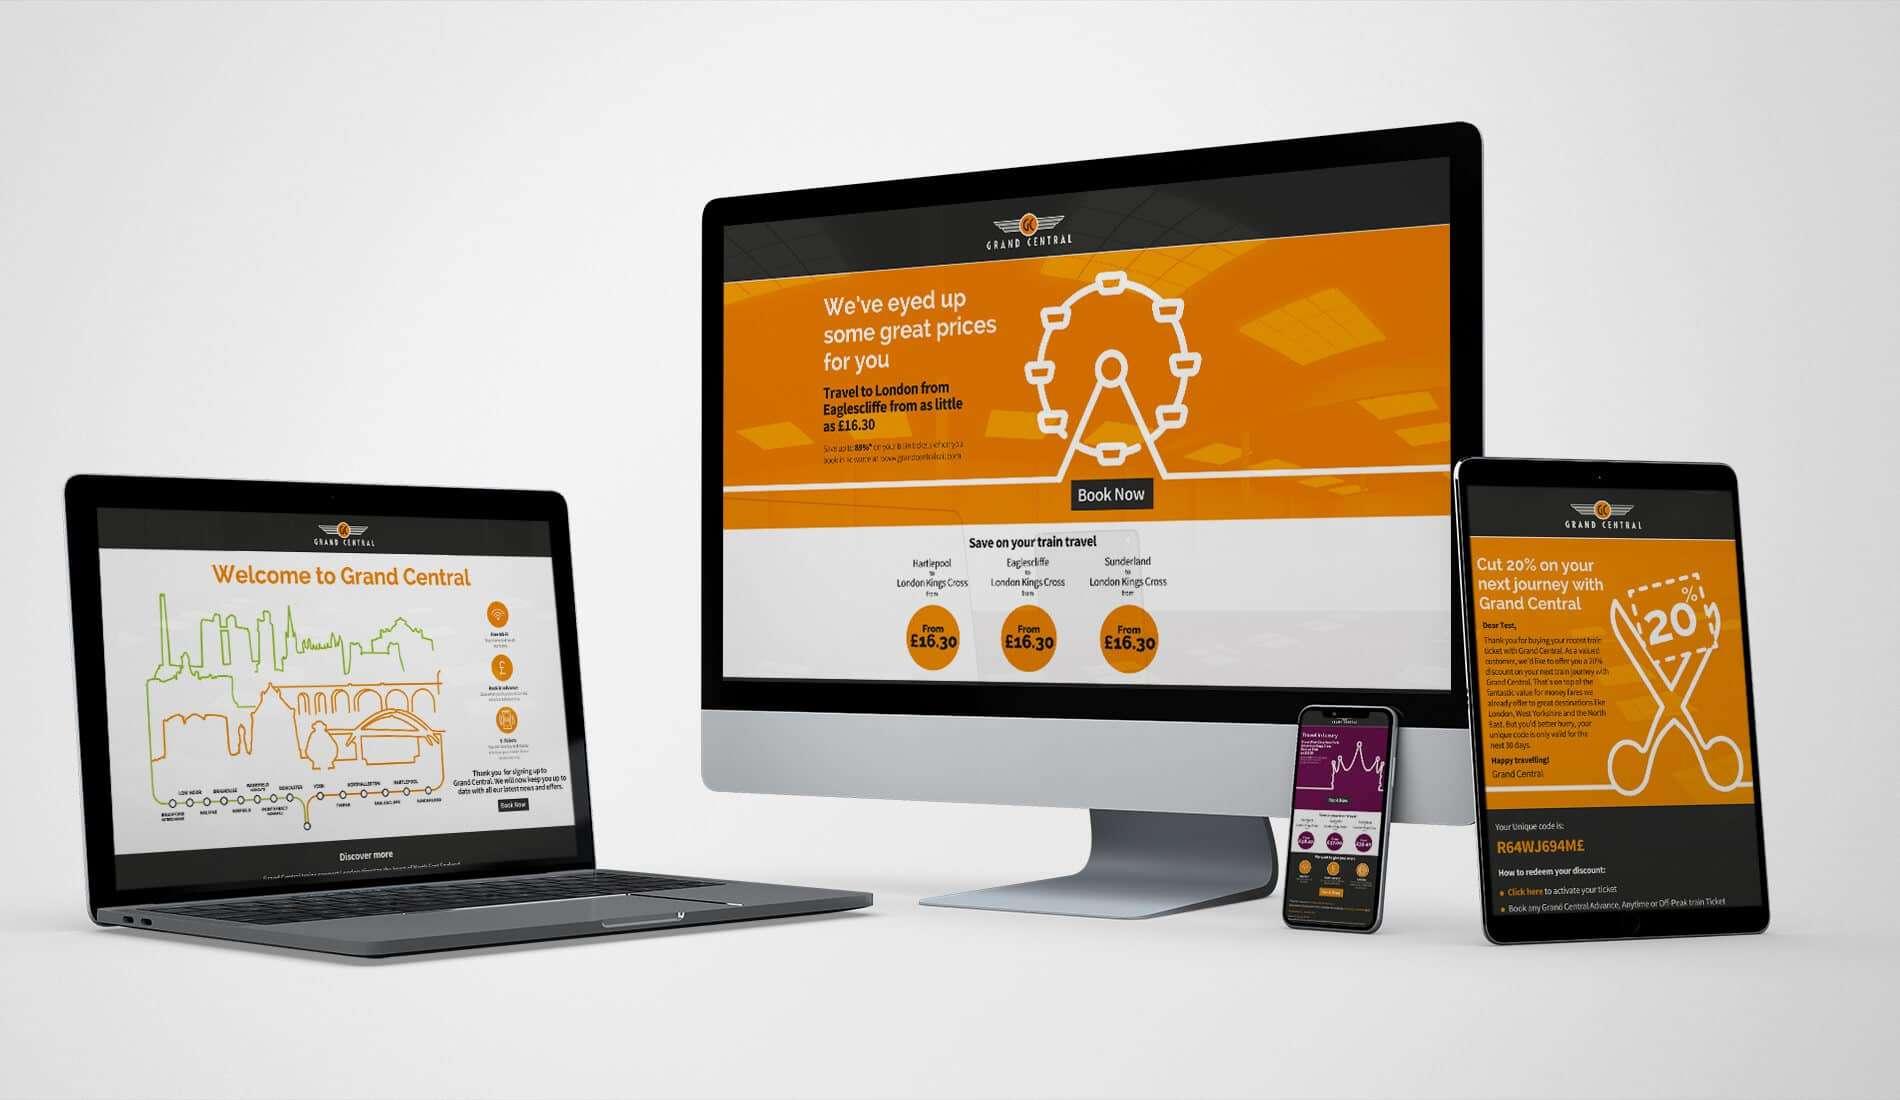 Grand central digital marketing campaigns